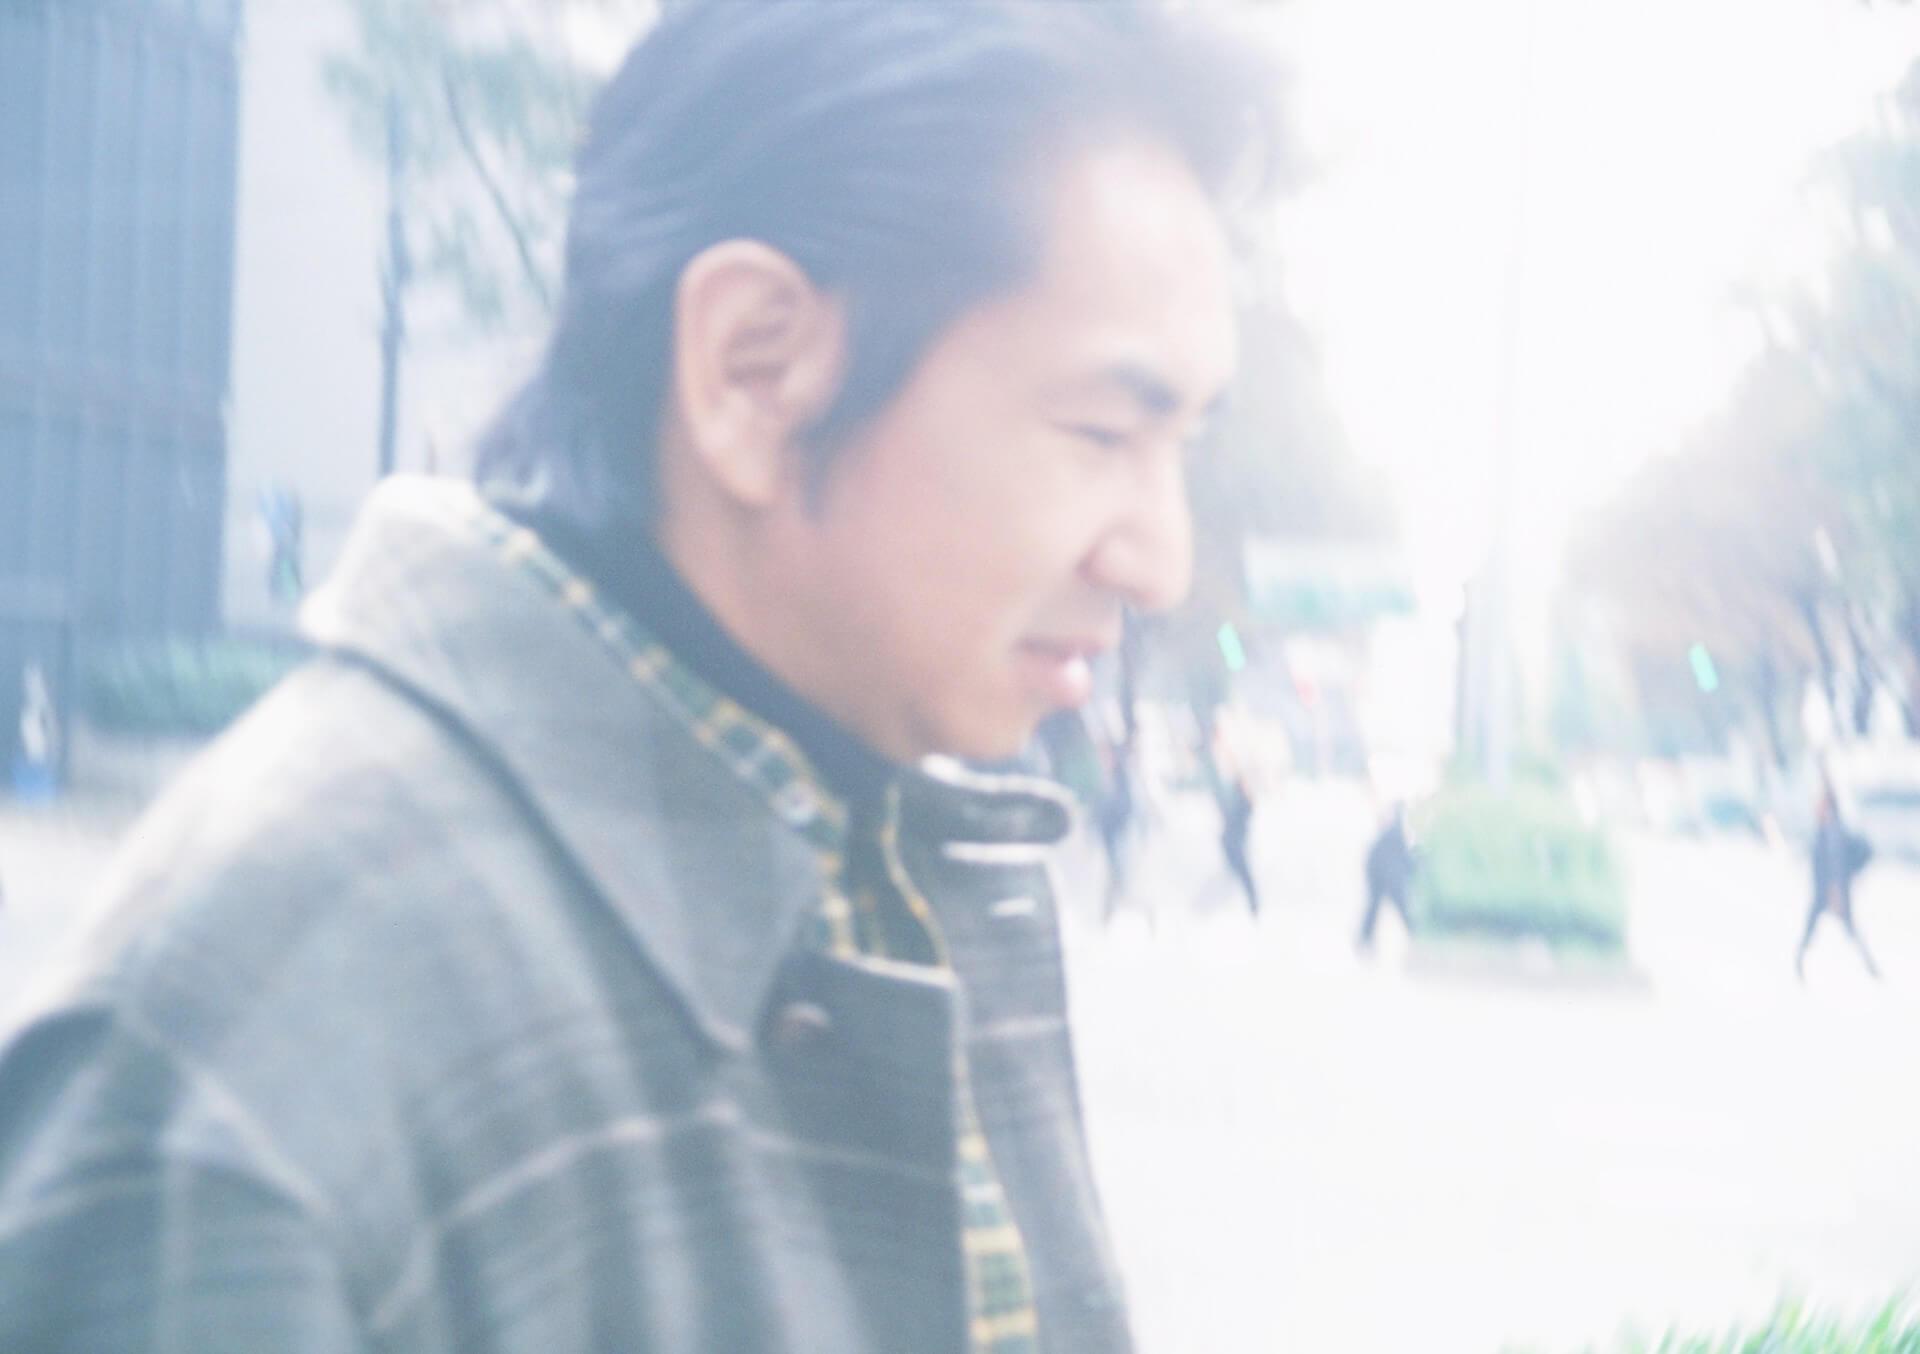 Reiの最新シングル「Territory Blues」配信開始&MVも完成!ハーレーダビッドソン × Rei によるコラボ・プロジェクト<SEEK for SOUL>オリジナル楽曲 music190919-rei-harley-davidson-5